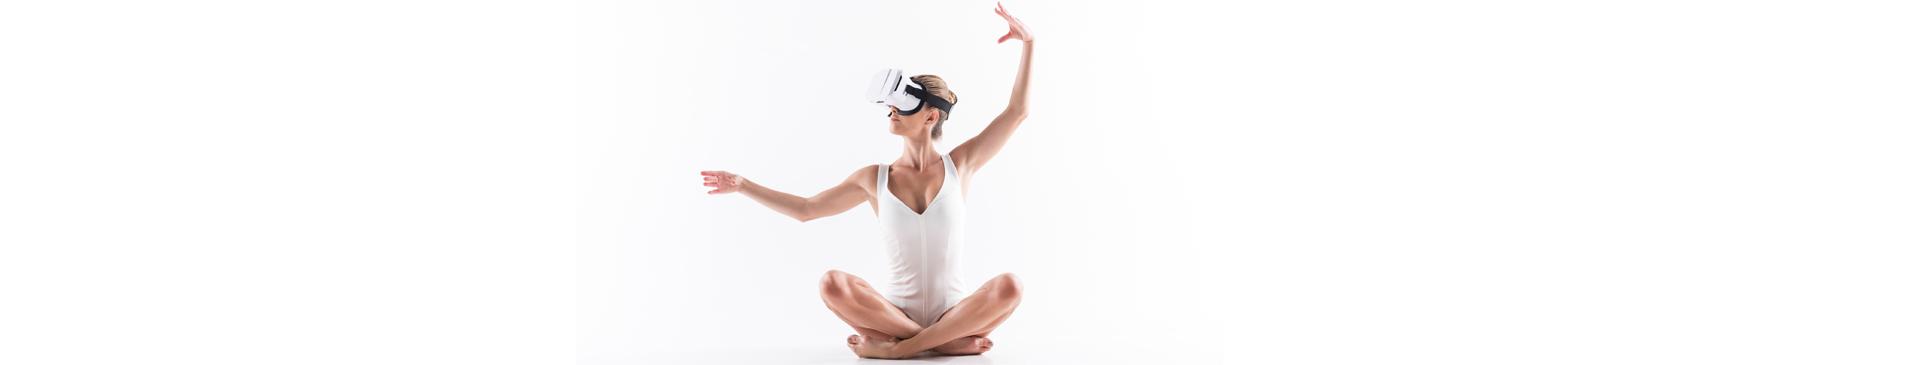 technologie gadgets yoga mindfulness meditatie